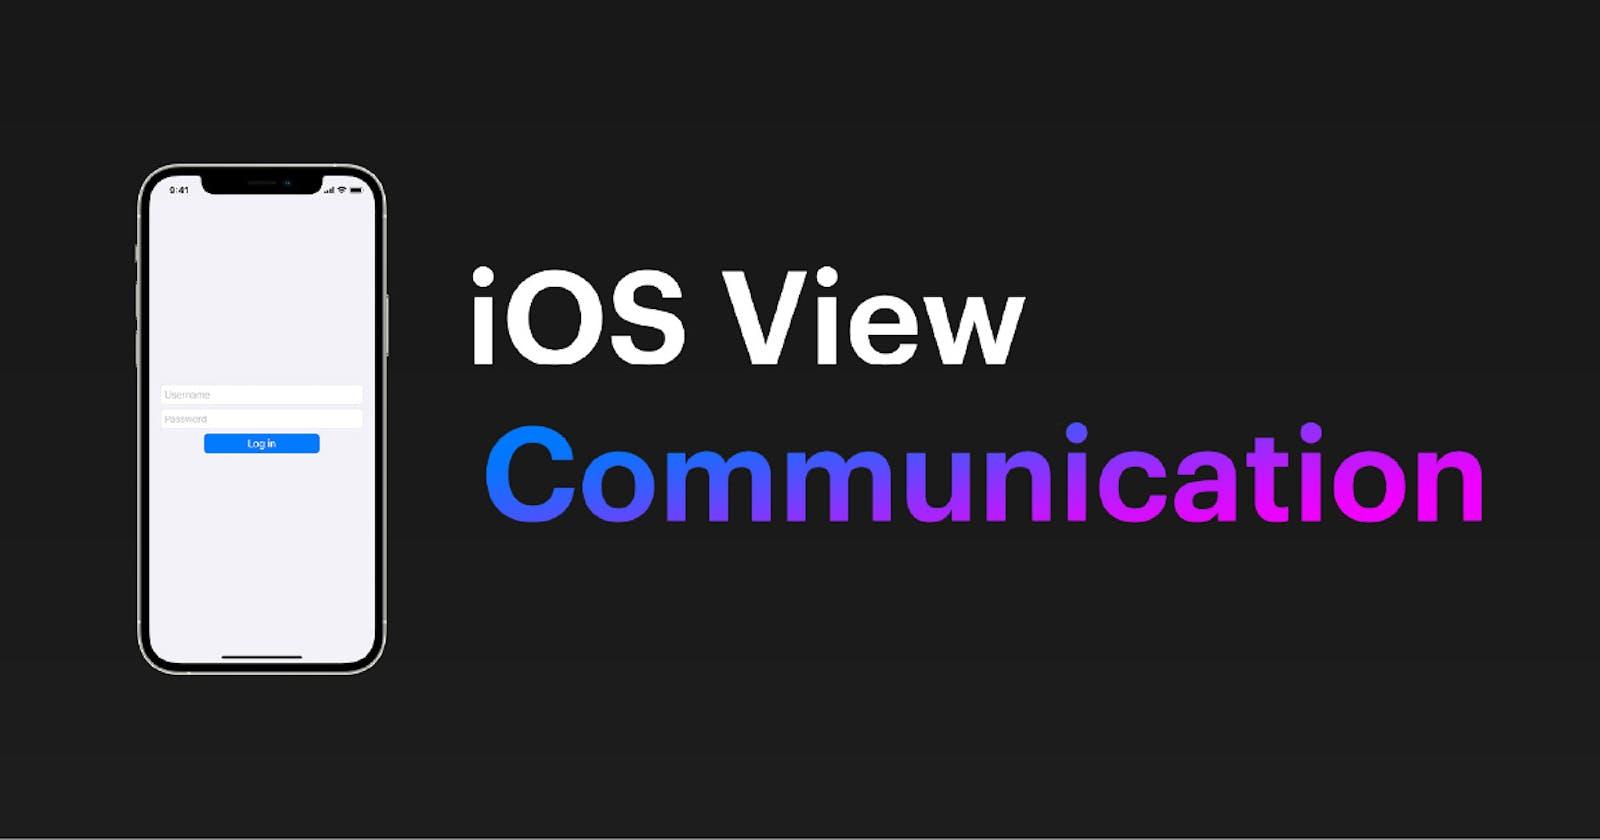 iOS View Communication